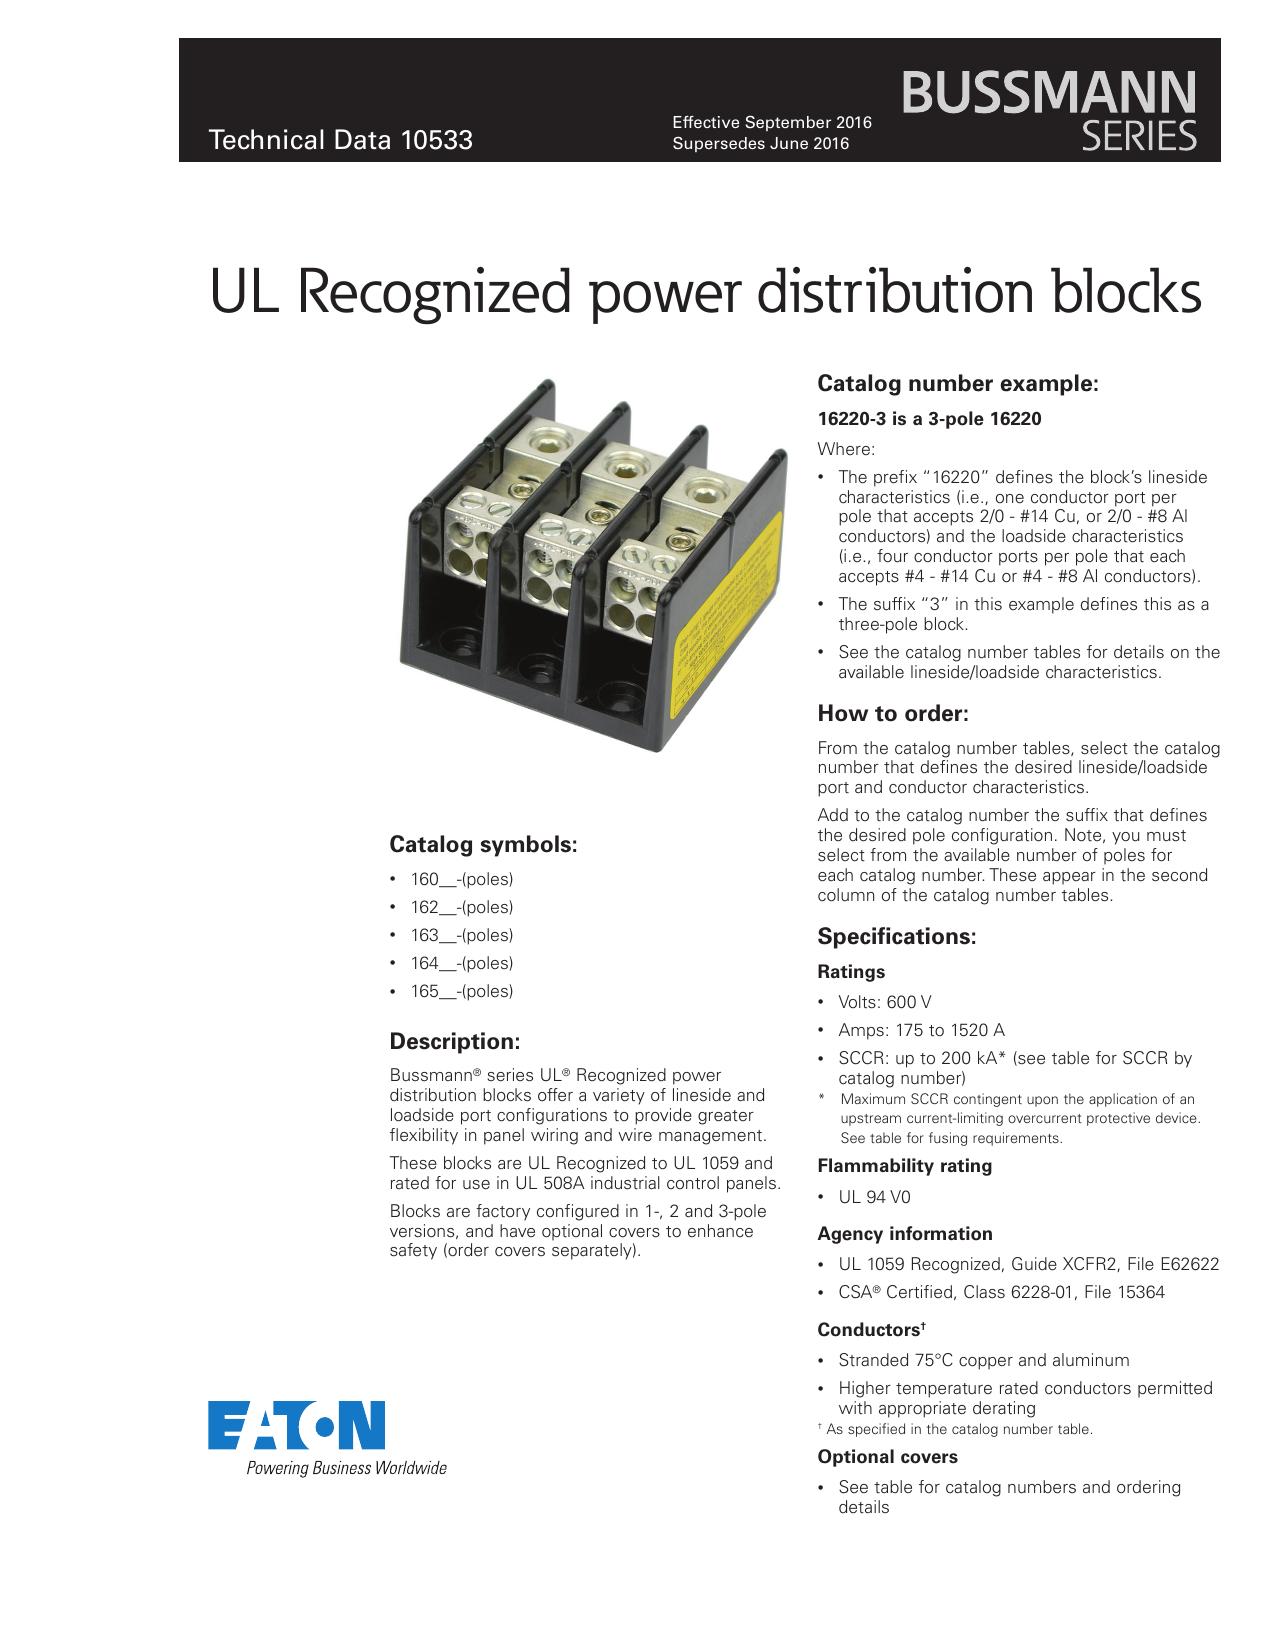 Bussmann series UL Recognized power distribution blocks data